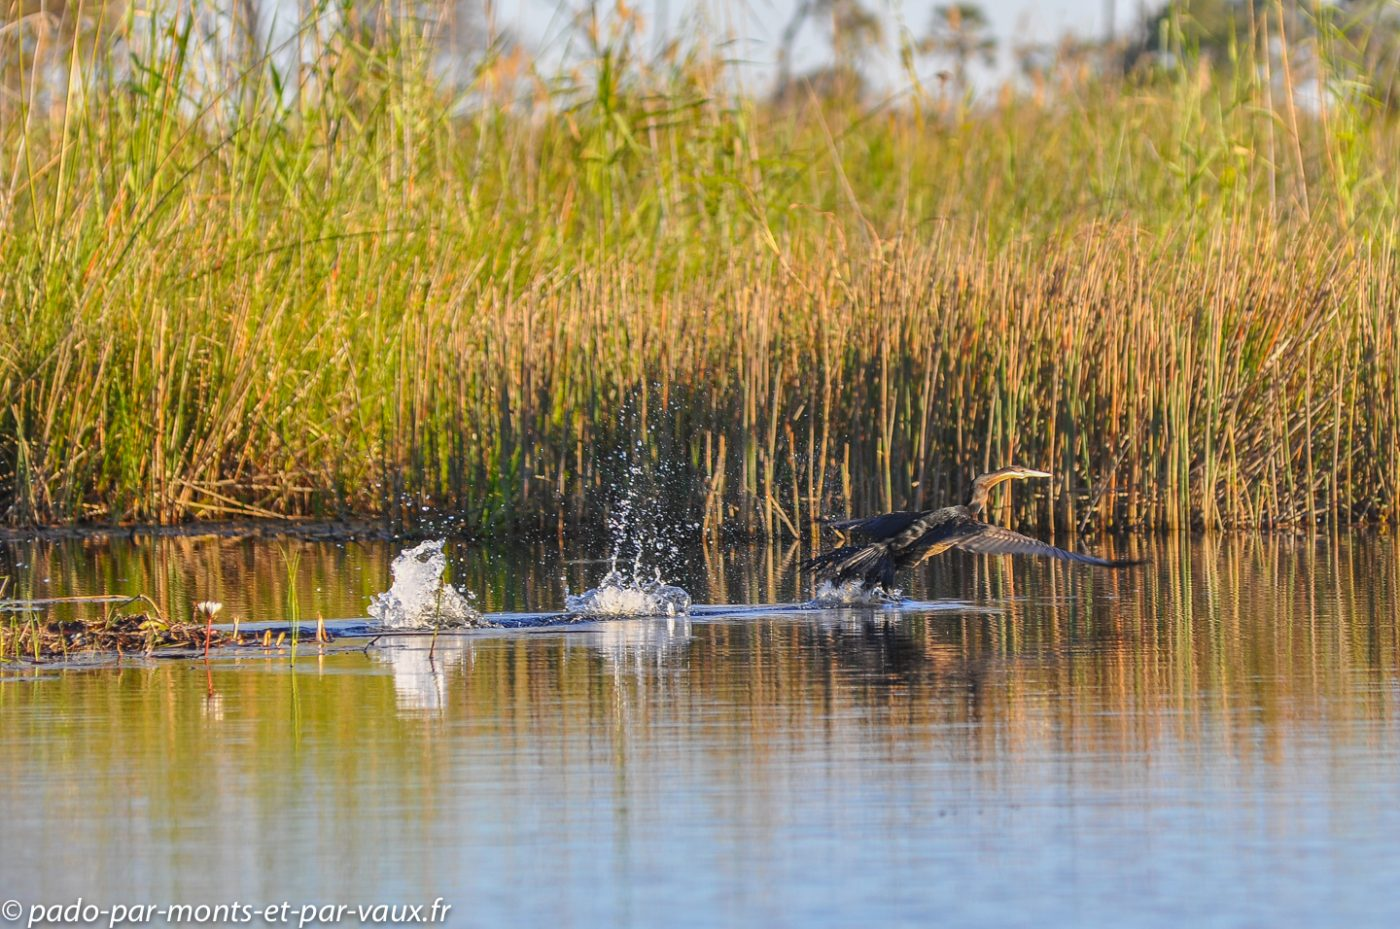 Botswana 2013 - Okavango - Anhinga dAfrique